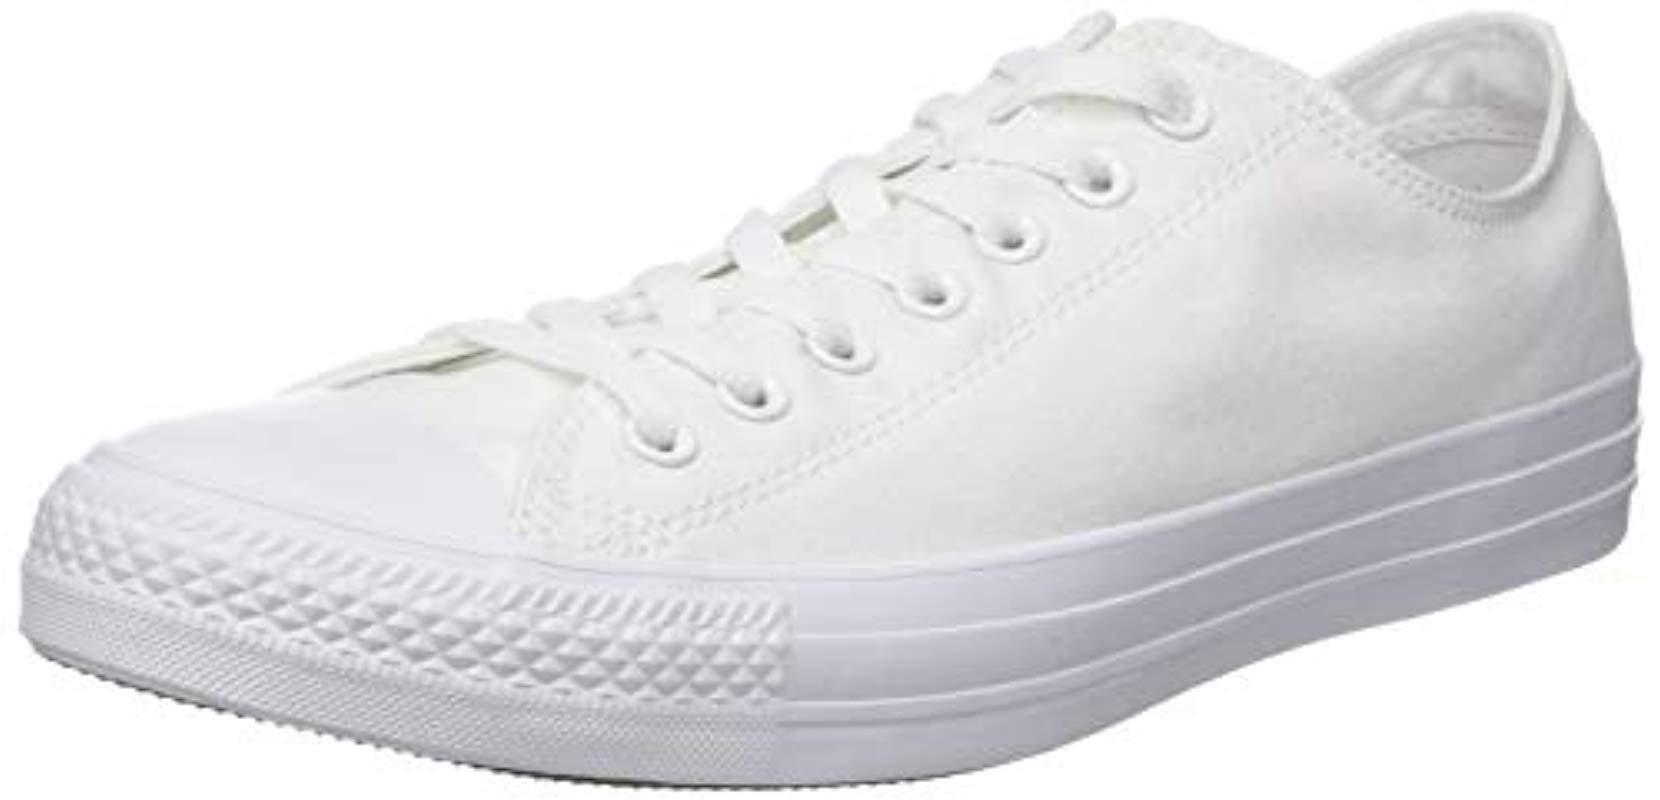 Converse. Men's White Chuck Taylor All Star Mono Leather Ox ...